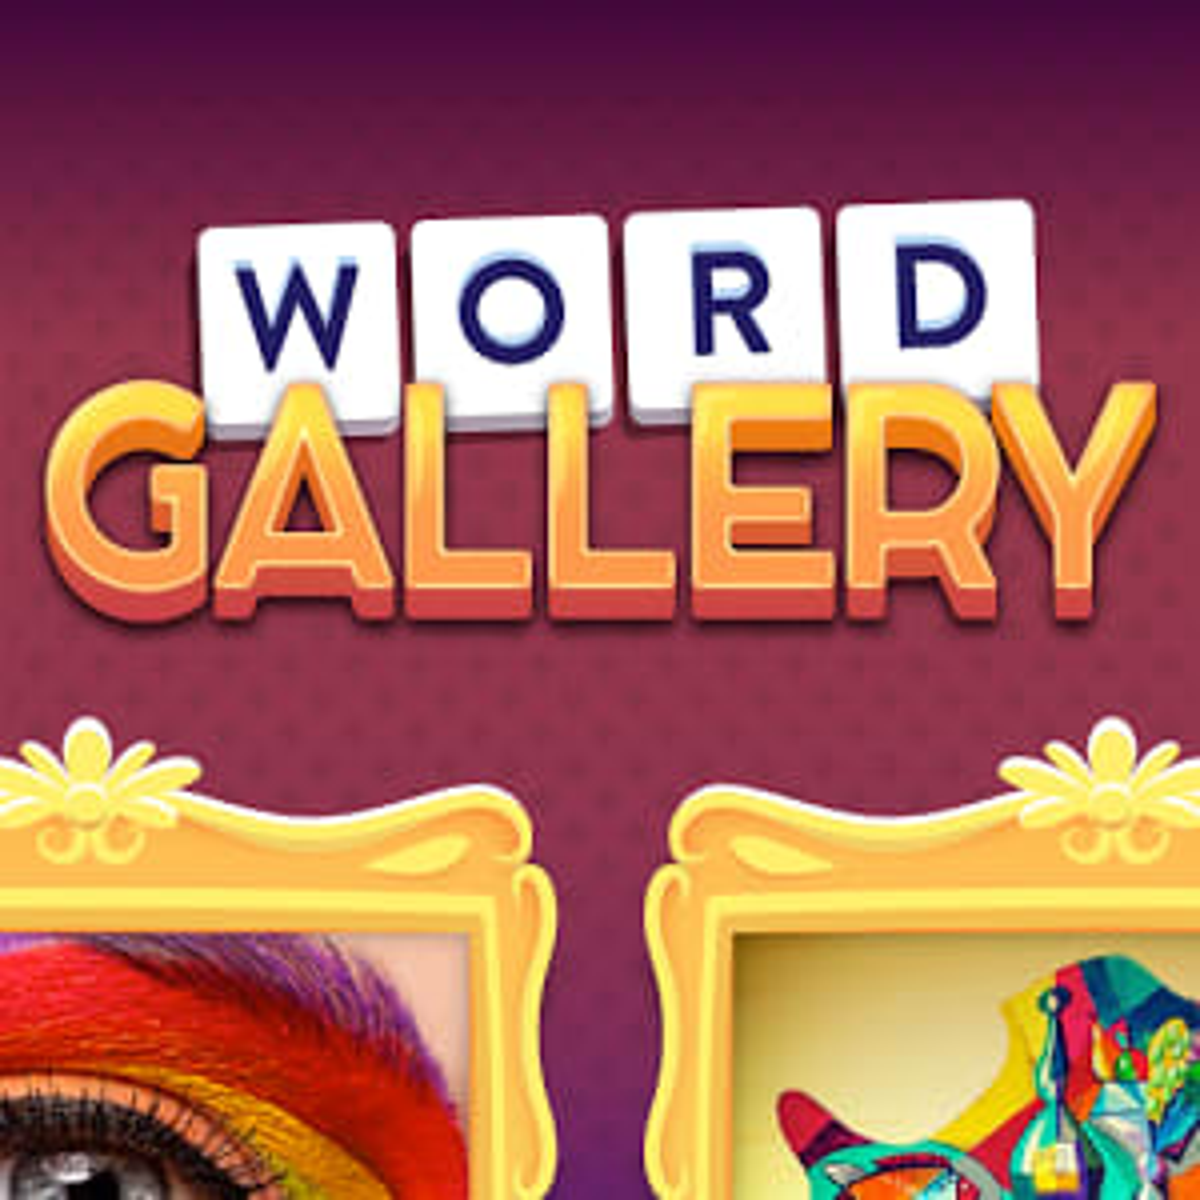 Word Gallery